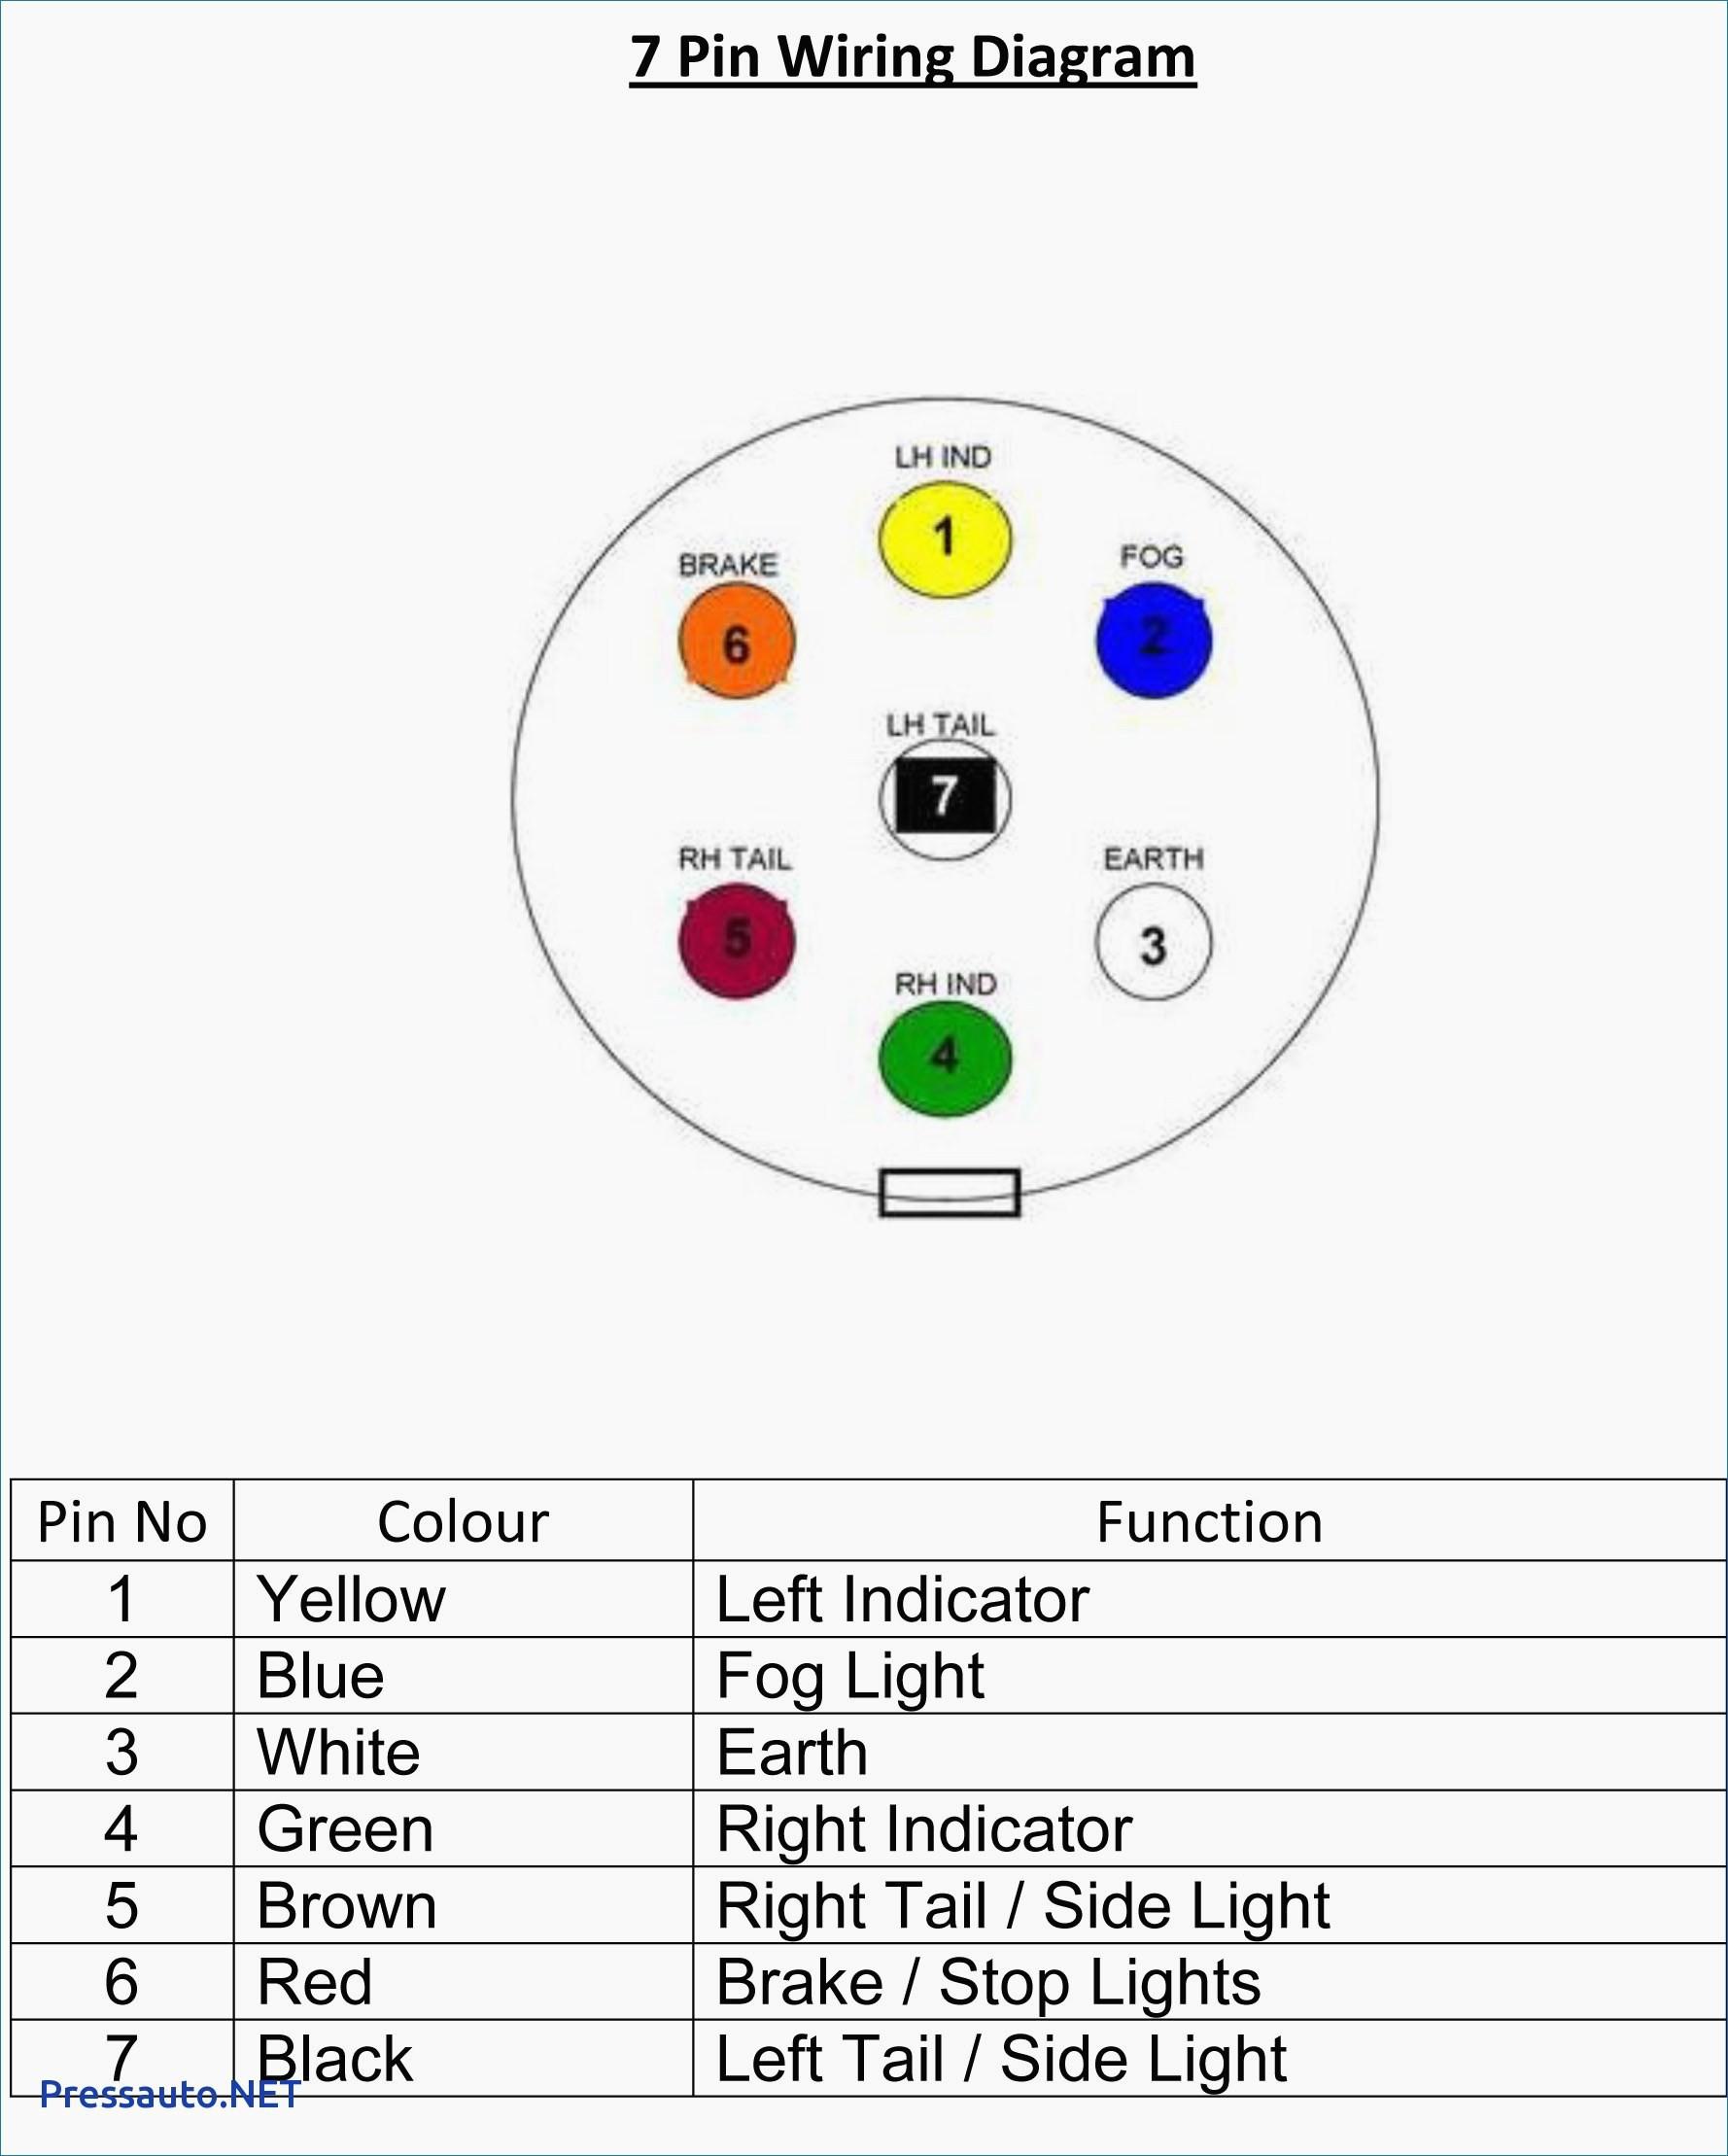 Pollak 12 705 Wiring Diagram | Best Wiring Library - 7 Way Trailer Plug Wiring Diagram Ford